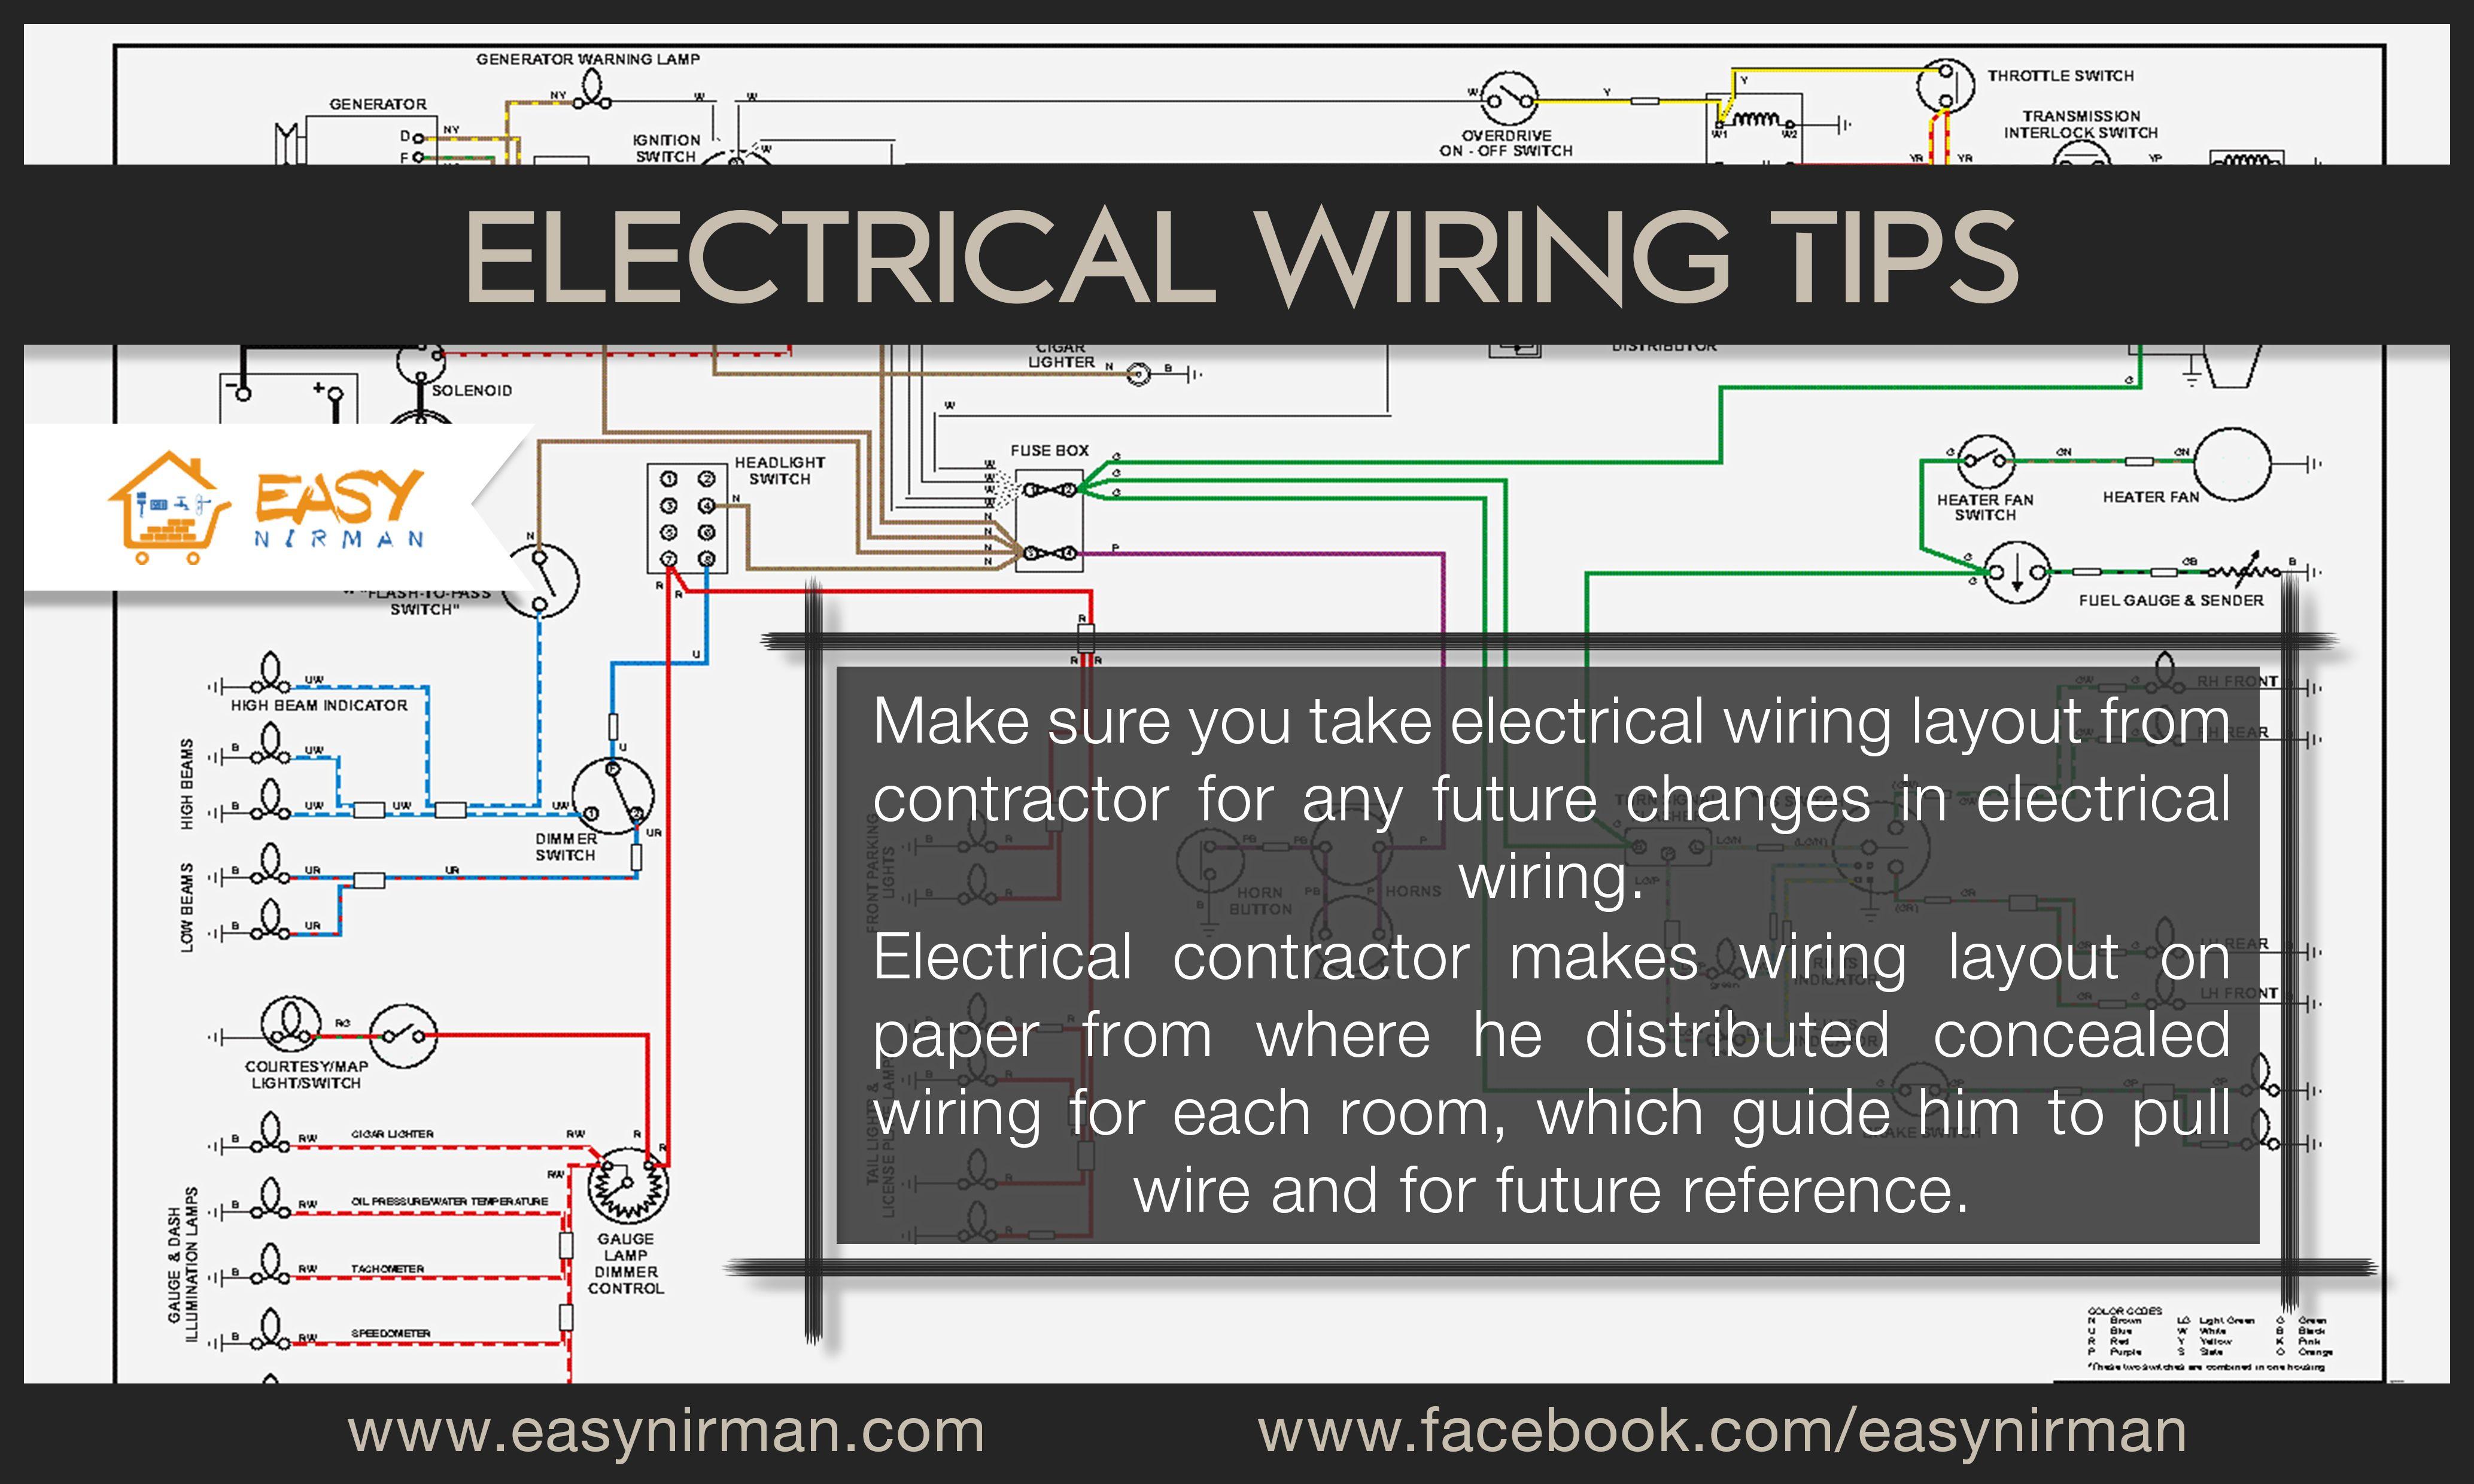 Electrical Wiring Tips: Make sure you take electrical wiring layout ...